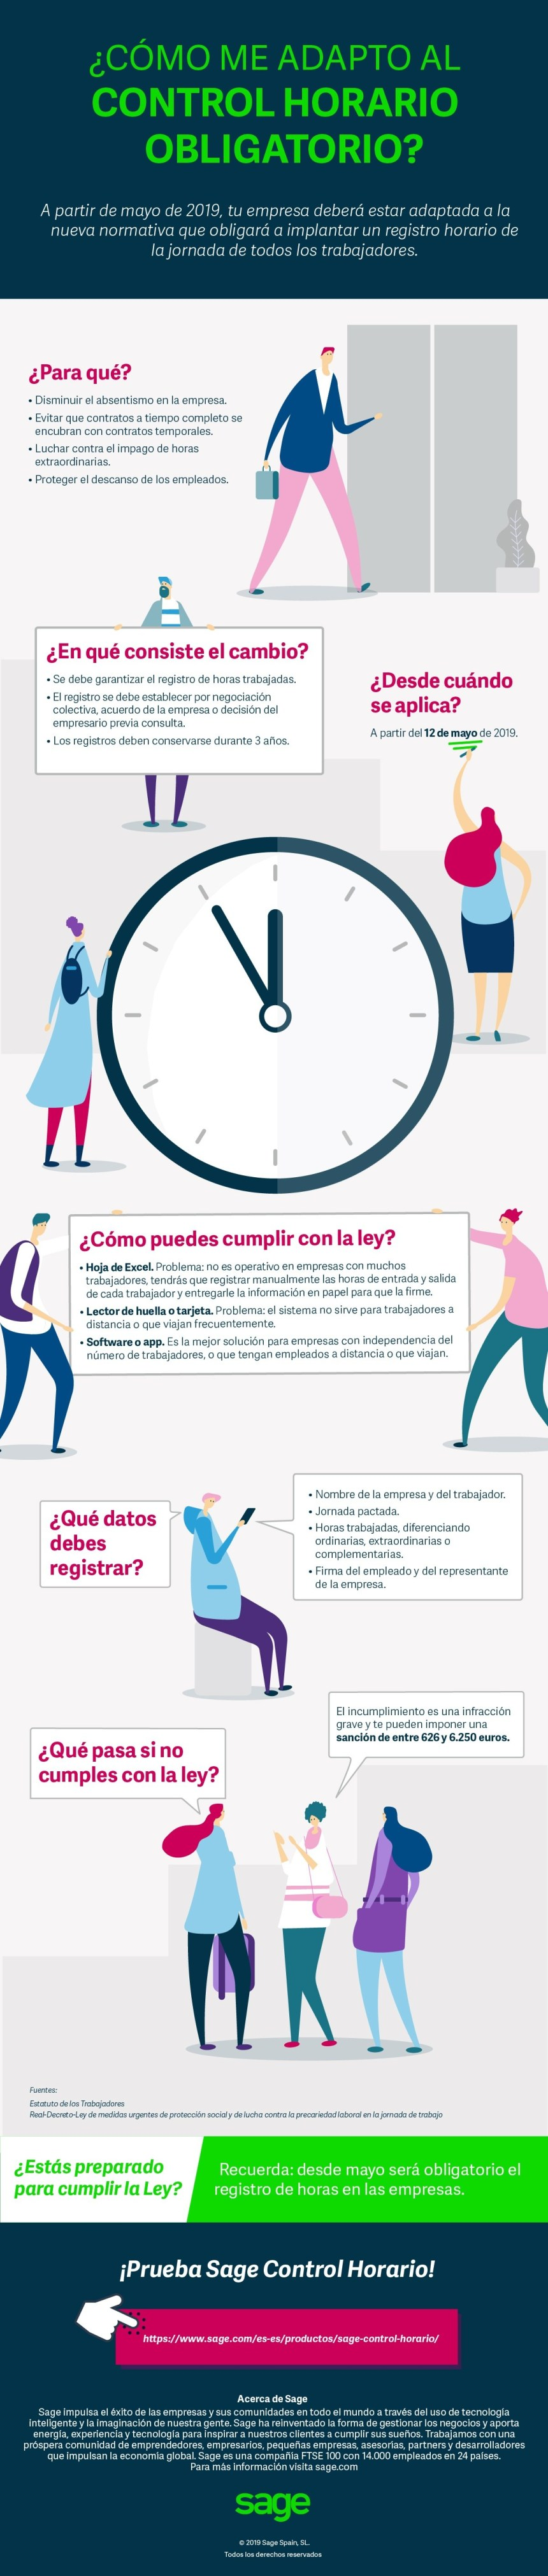 Cómo me adapto al control horario obligatorio #infografia #infographic #rrhh